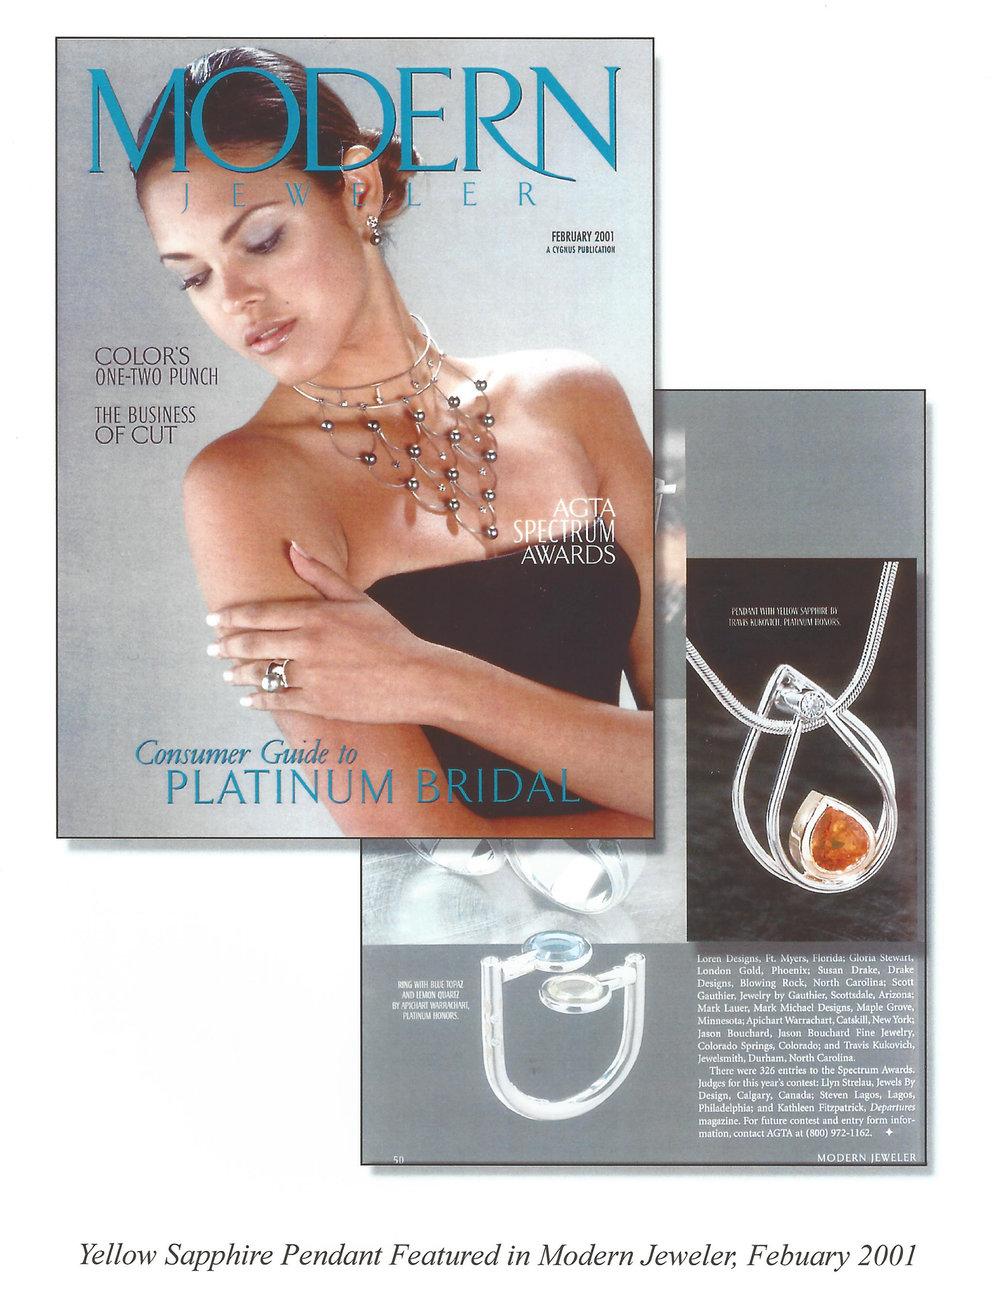 moder-jeweler-february-2001.jpg